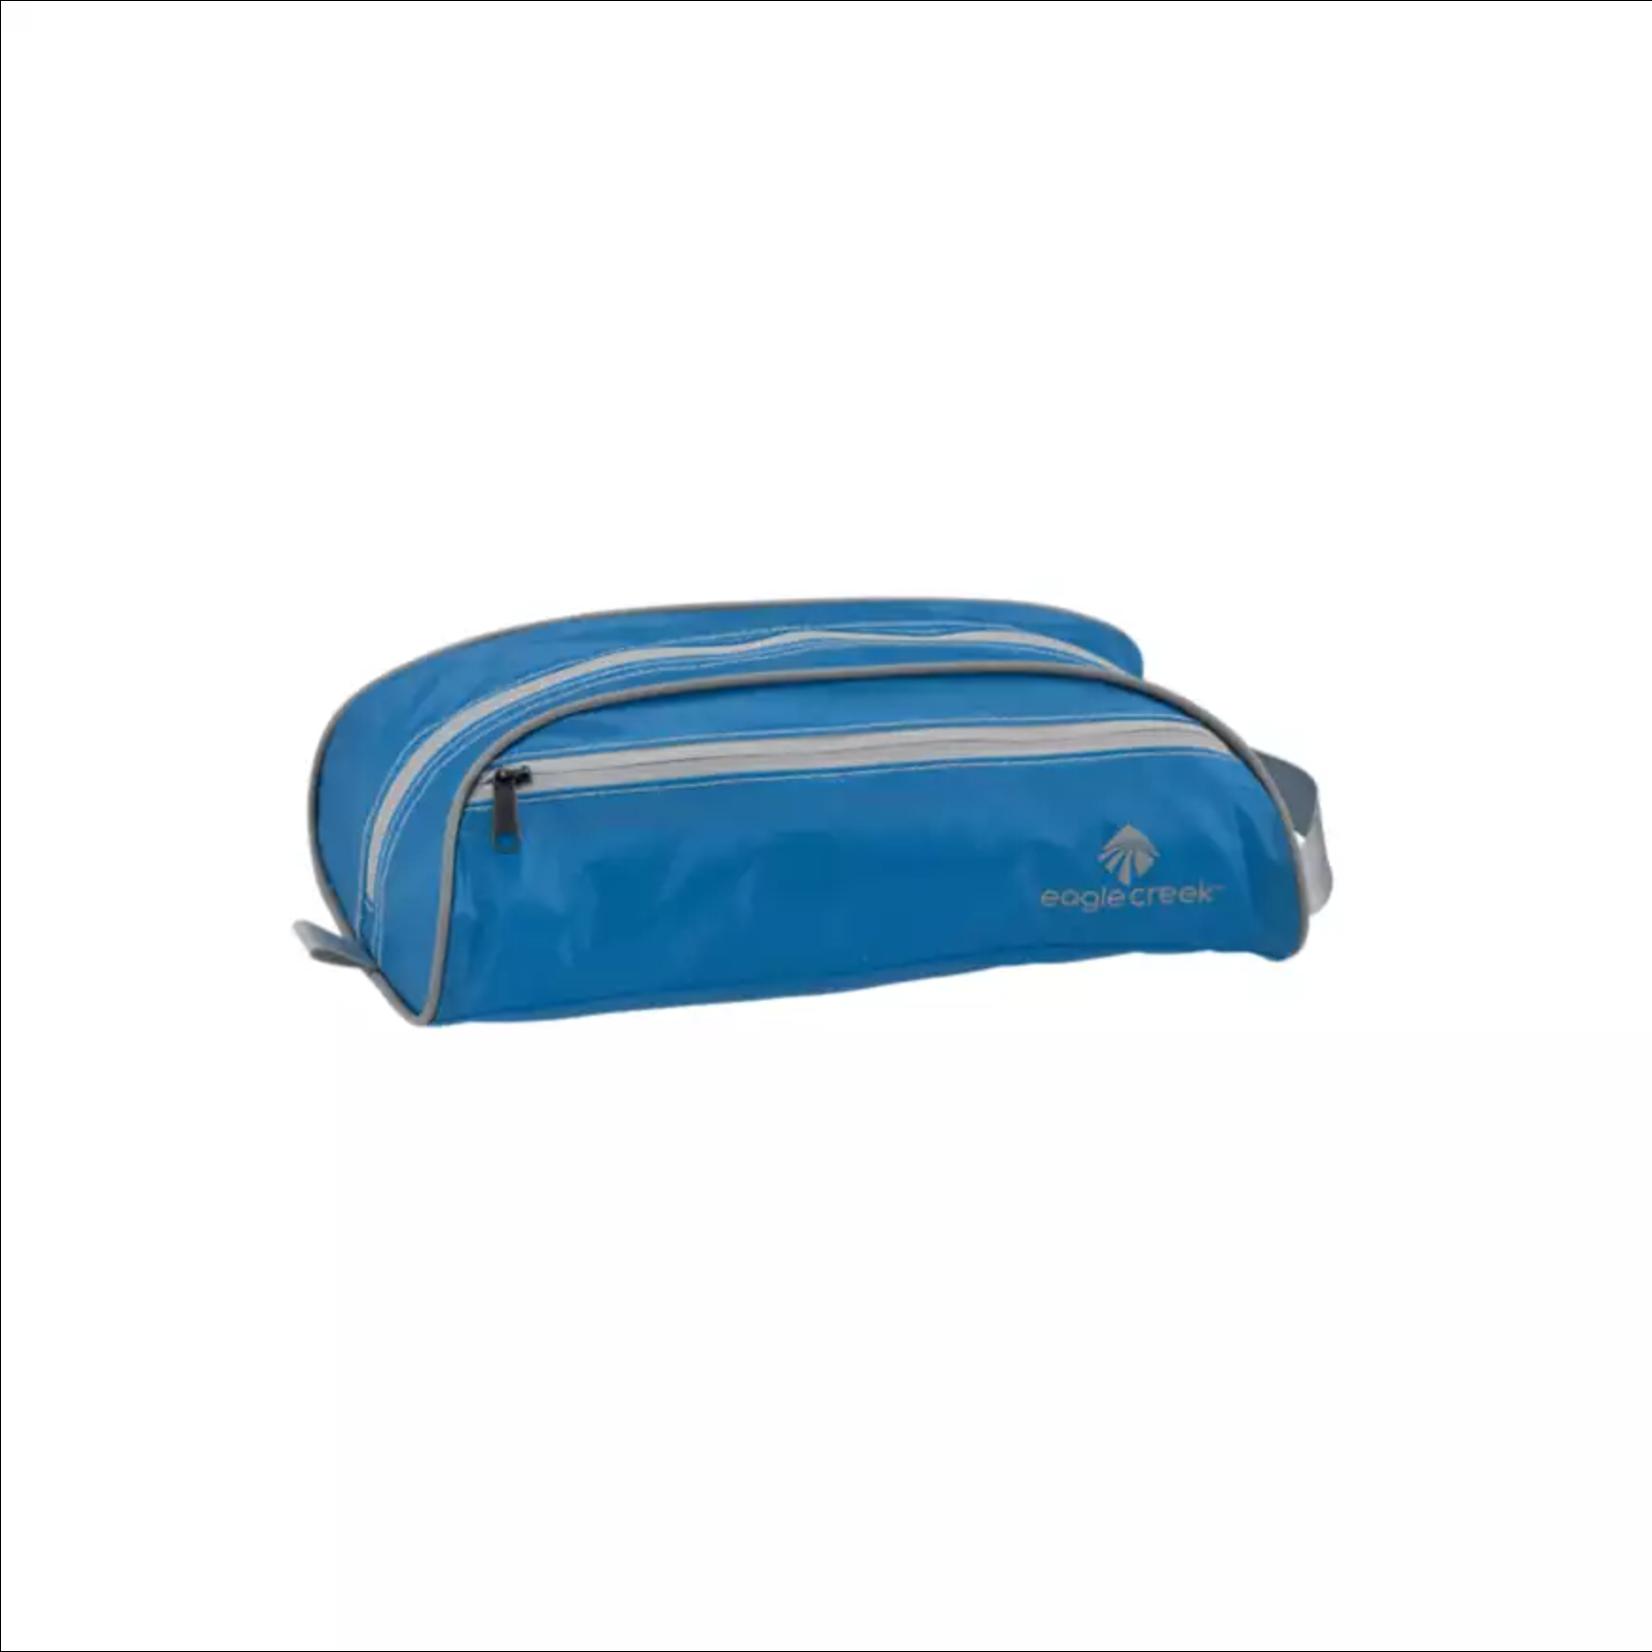 EAGLE CREEK PACK-IT SPECTER QUICK TRIP